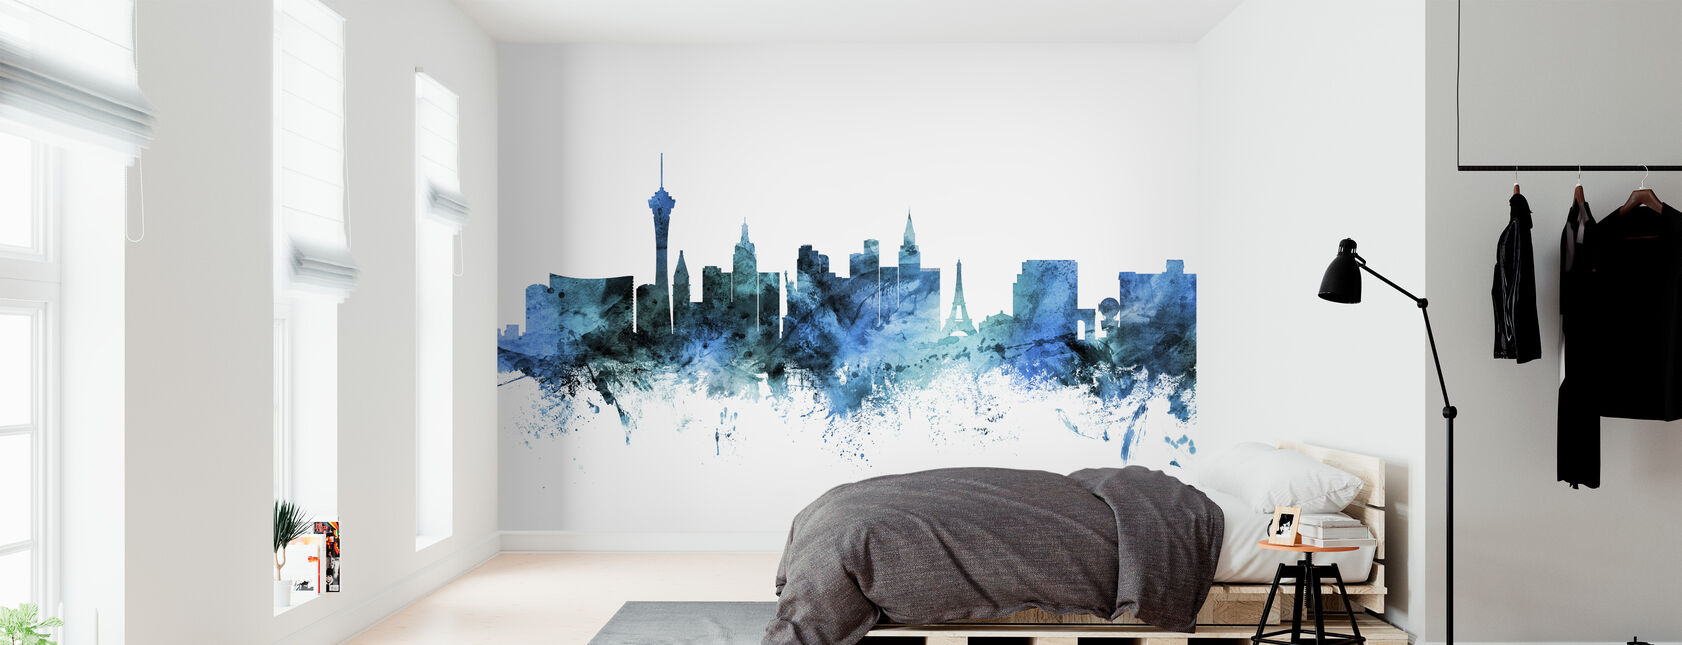 Las Vegas Nevada Skyline - Wallpaper - Bedroom